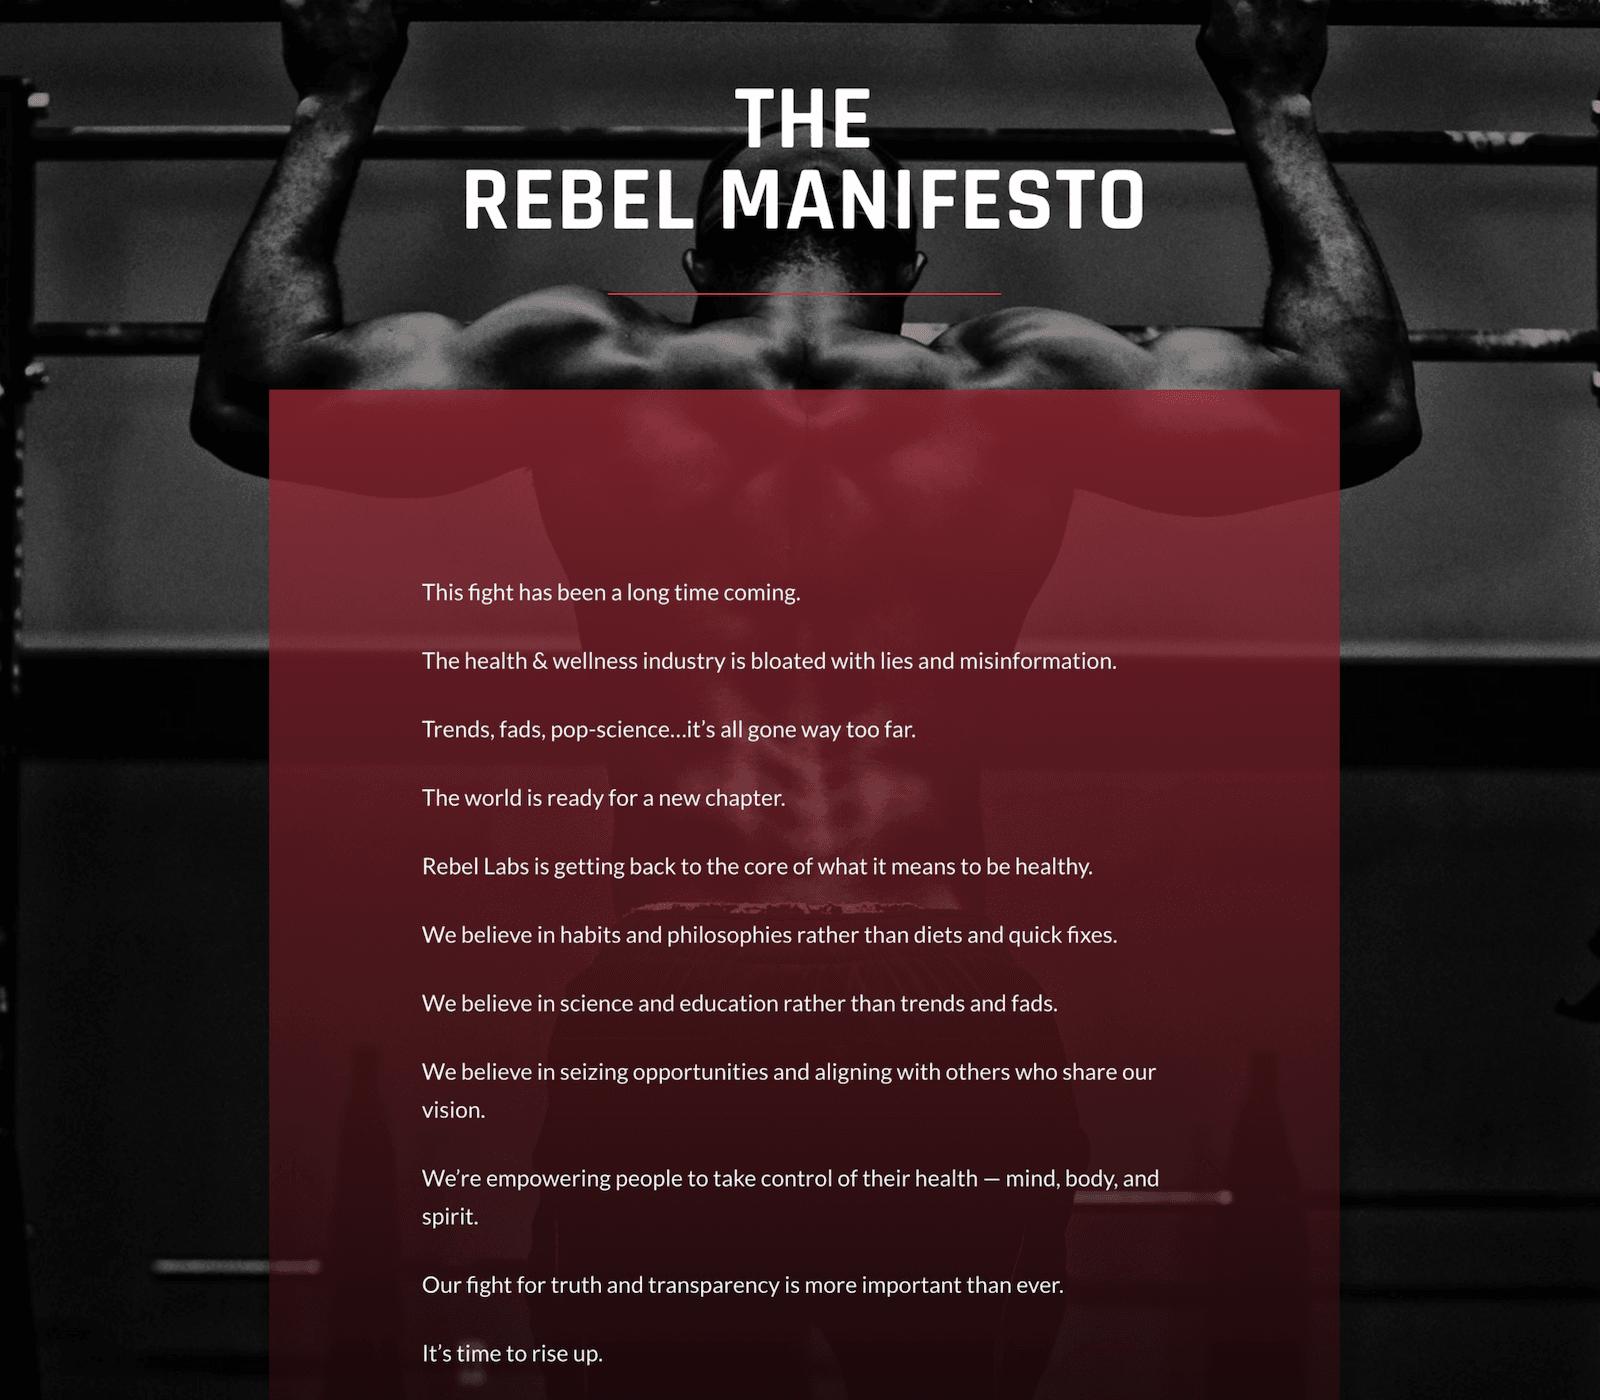 rebelmanifesto.png